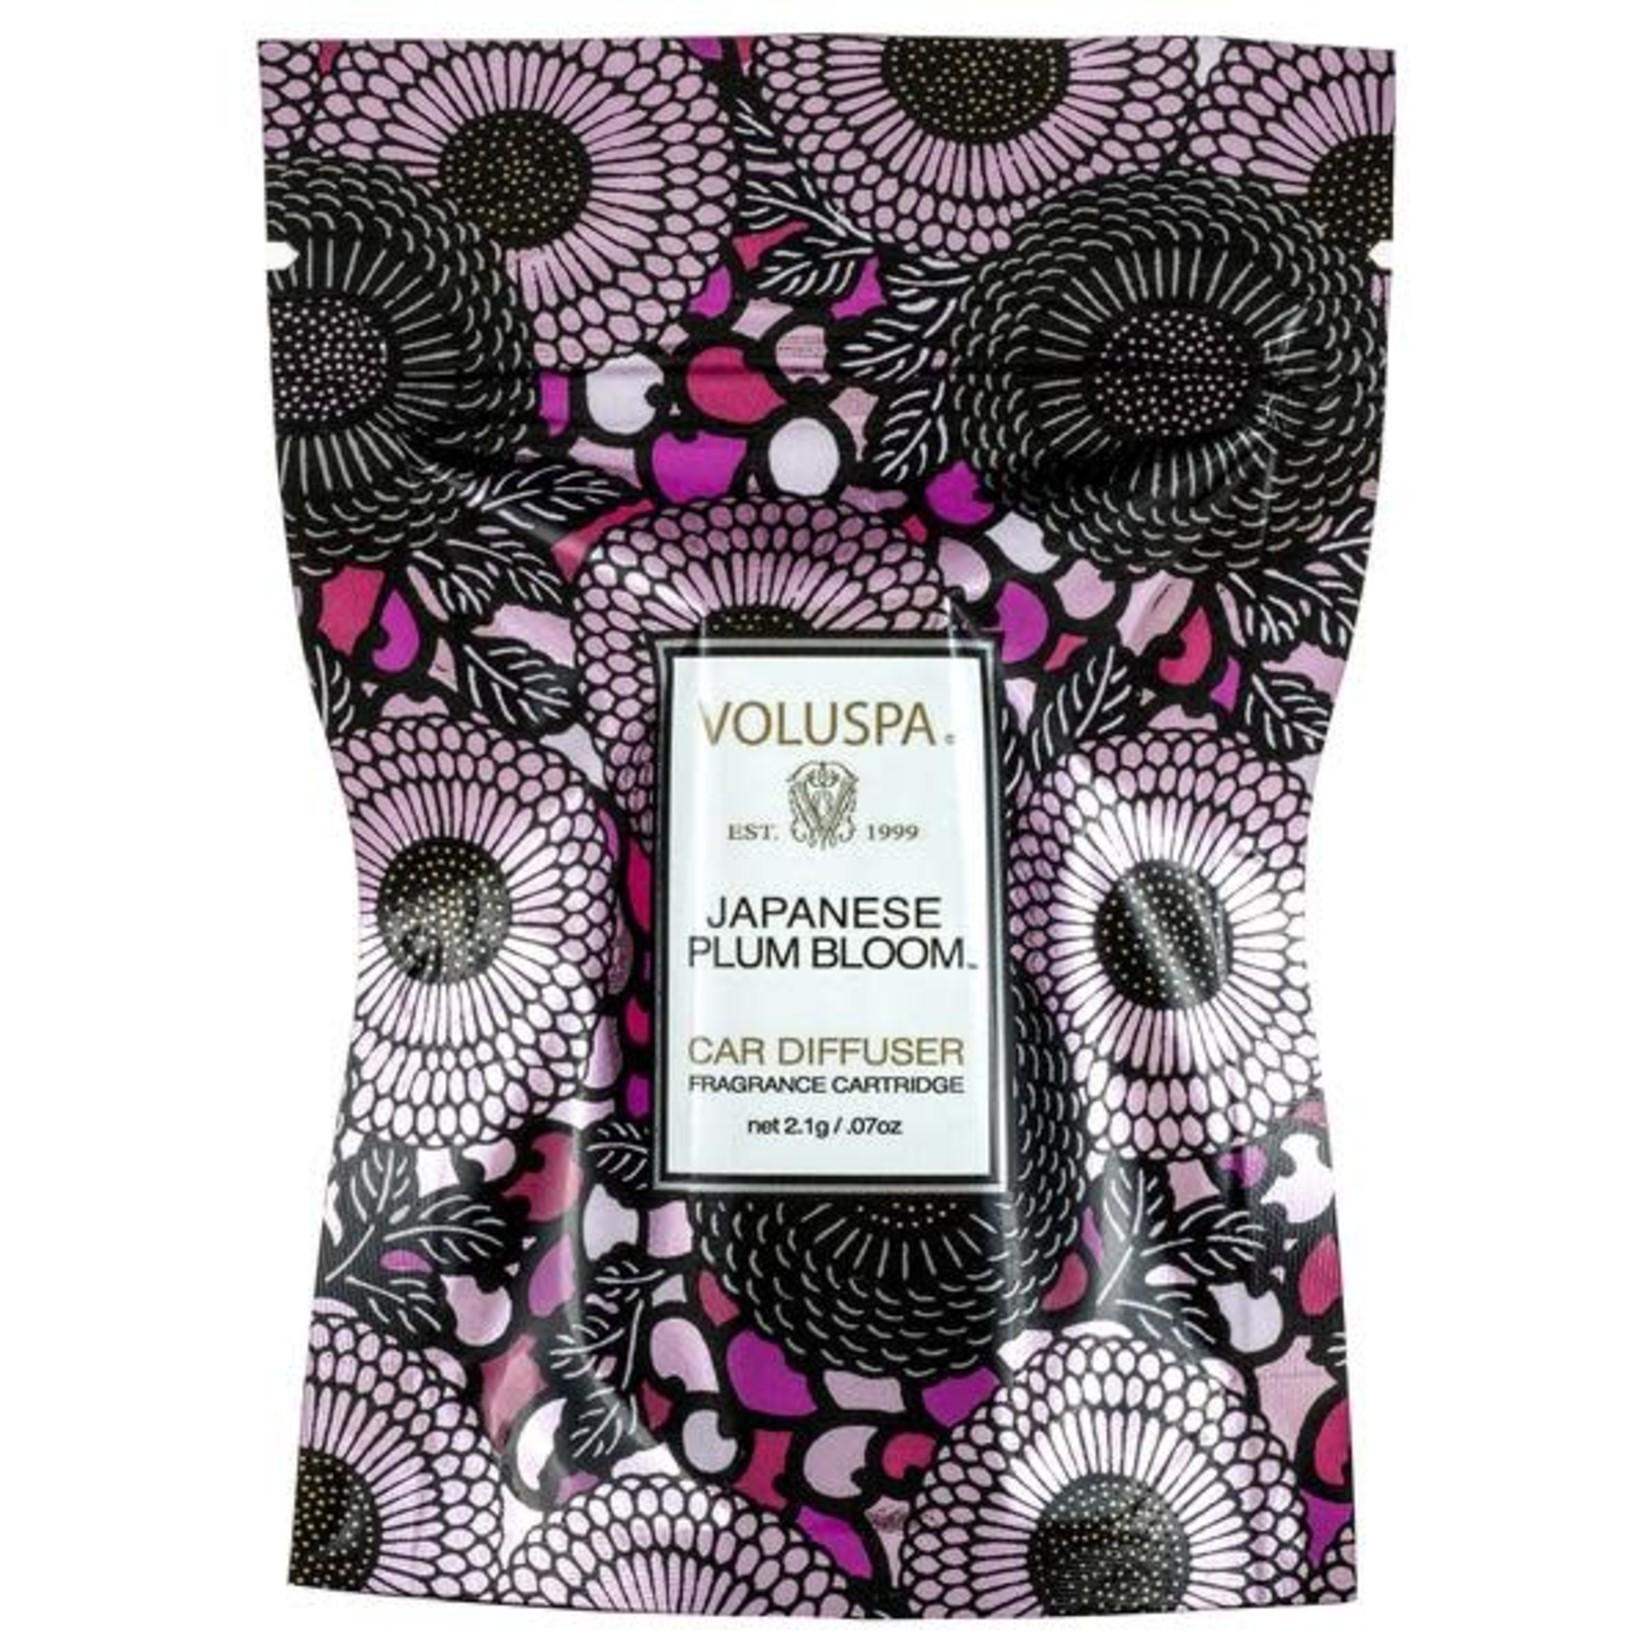 Voluspa Japanese Plum Bloom Fragrance Cartridge Refill pouch